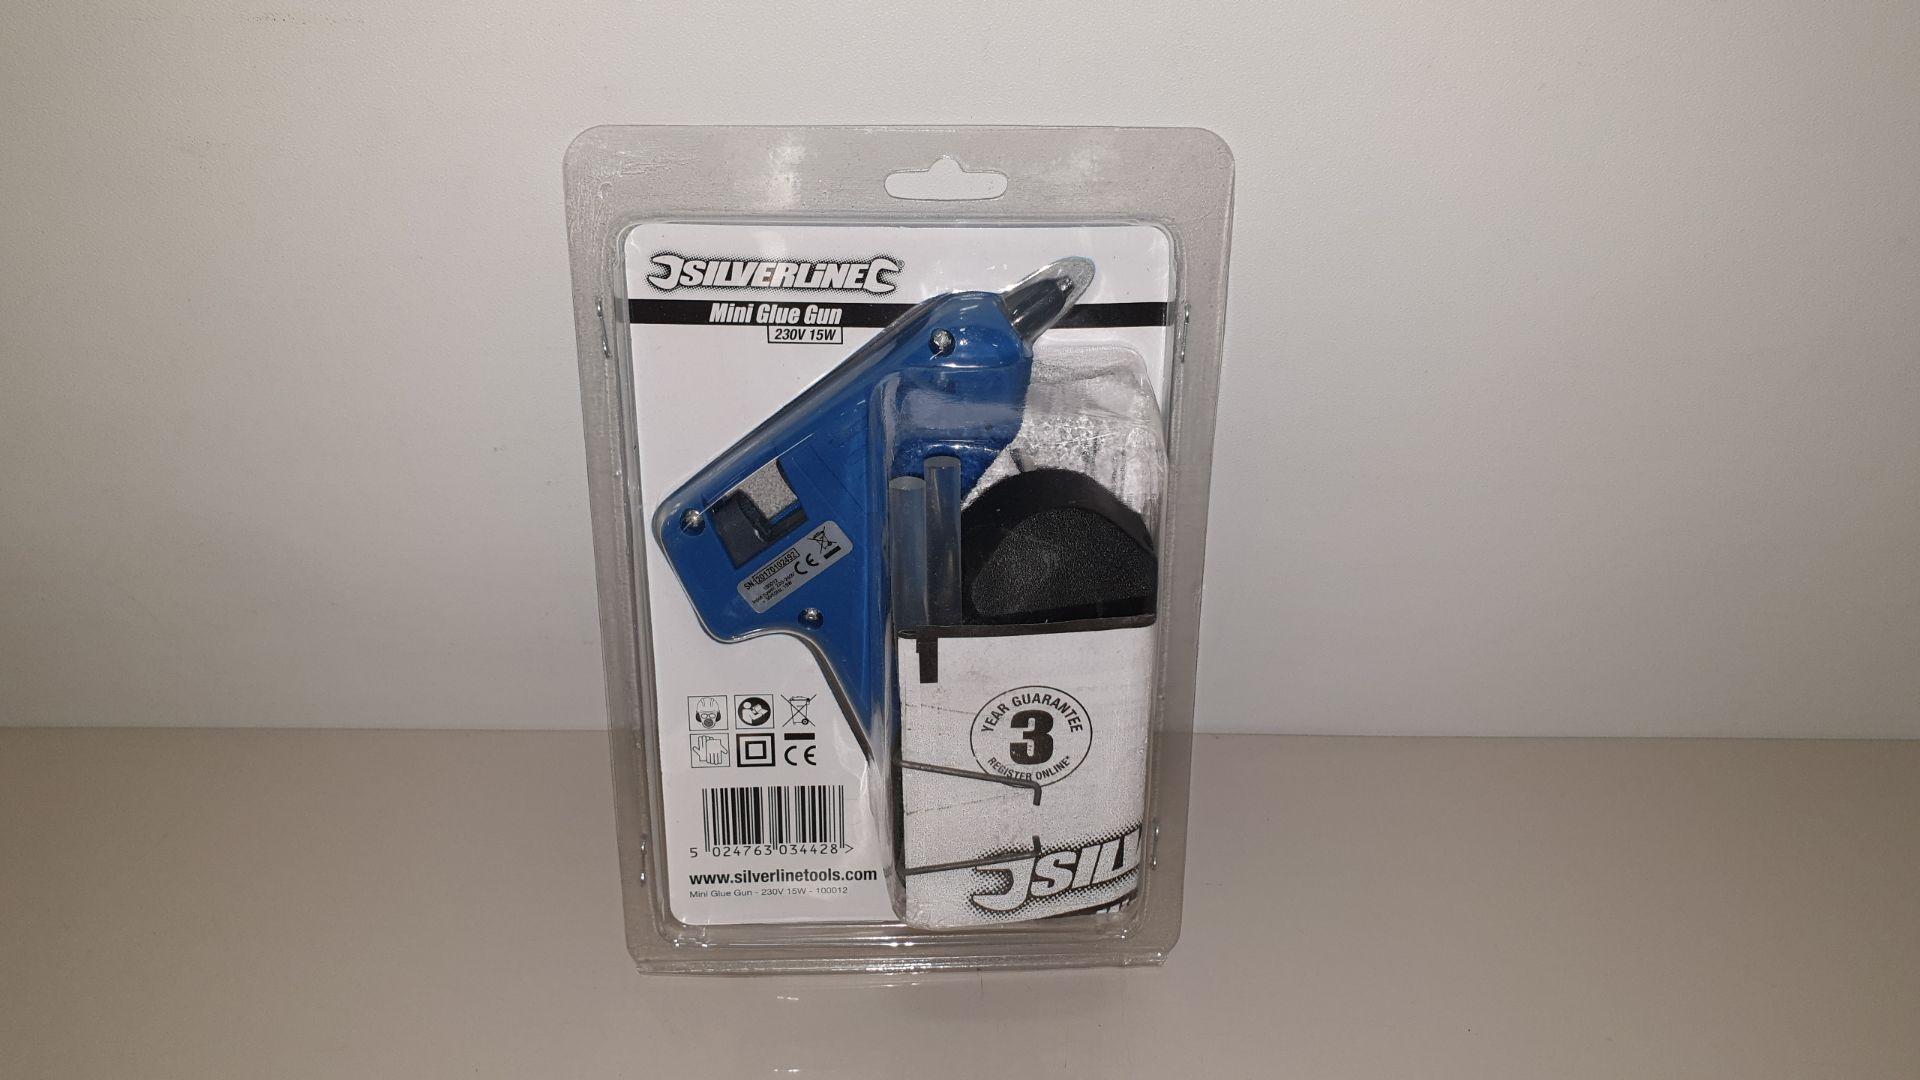 Lot 298 - 36 X SILVERLINE MINI HOT MELT GLUE GUNS 230V 7-10W PLUS 2 GLUE STICKS (PROD CODE 100012) TRADE PRICE